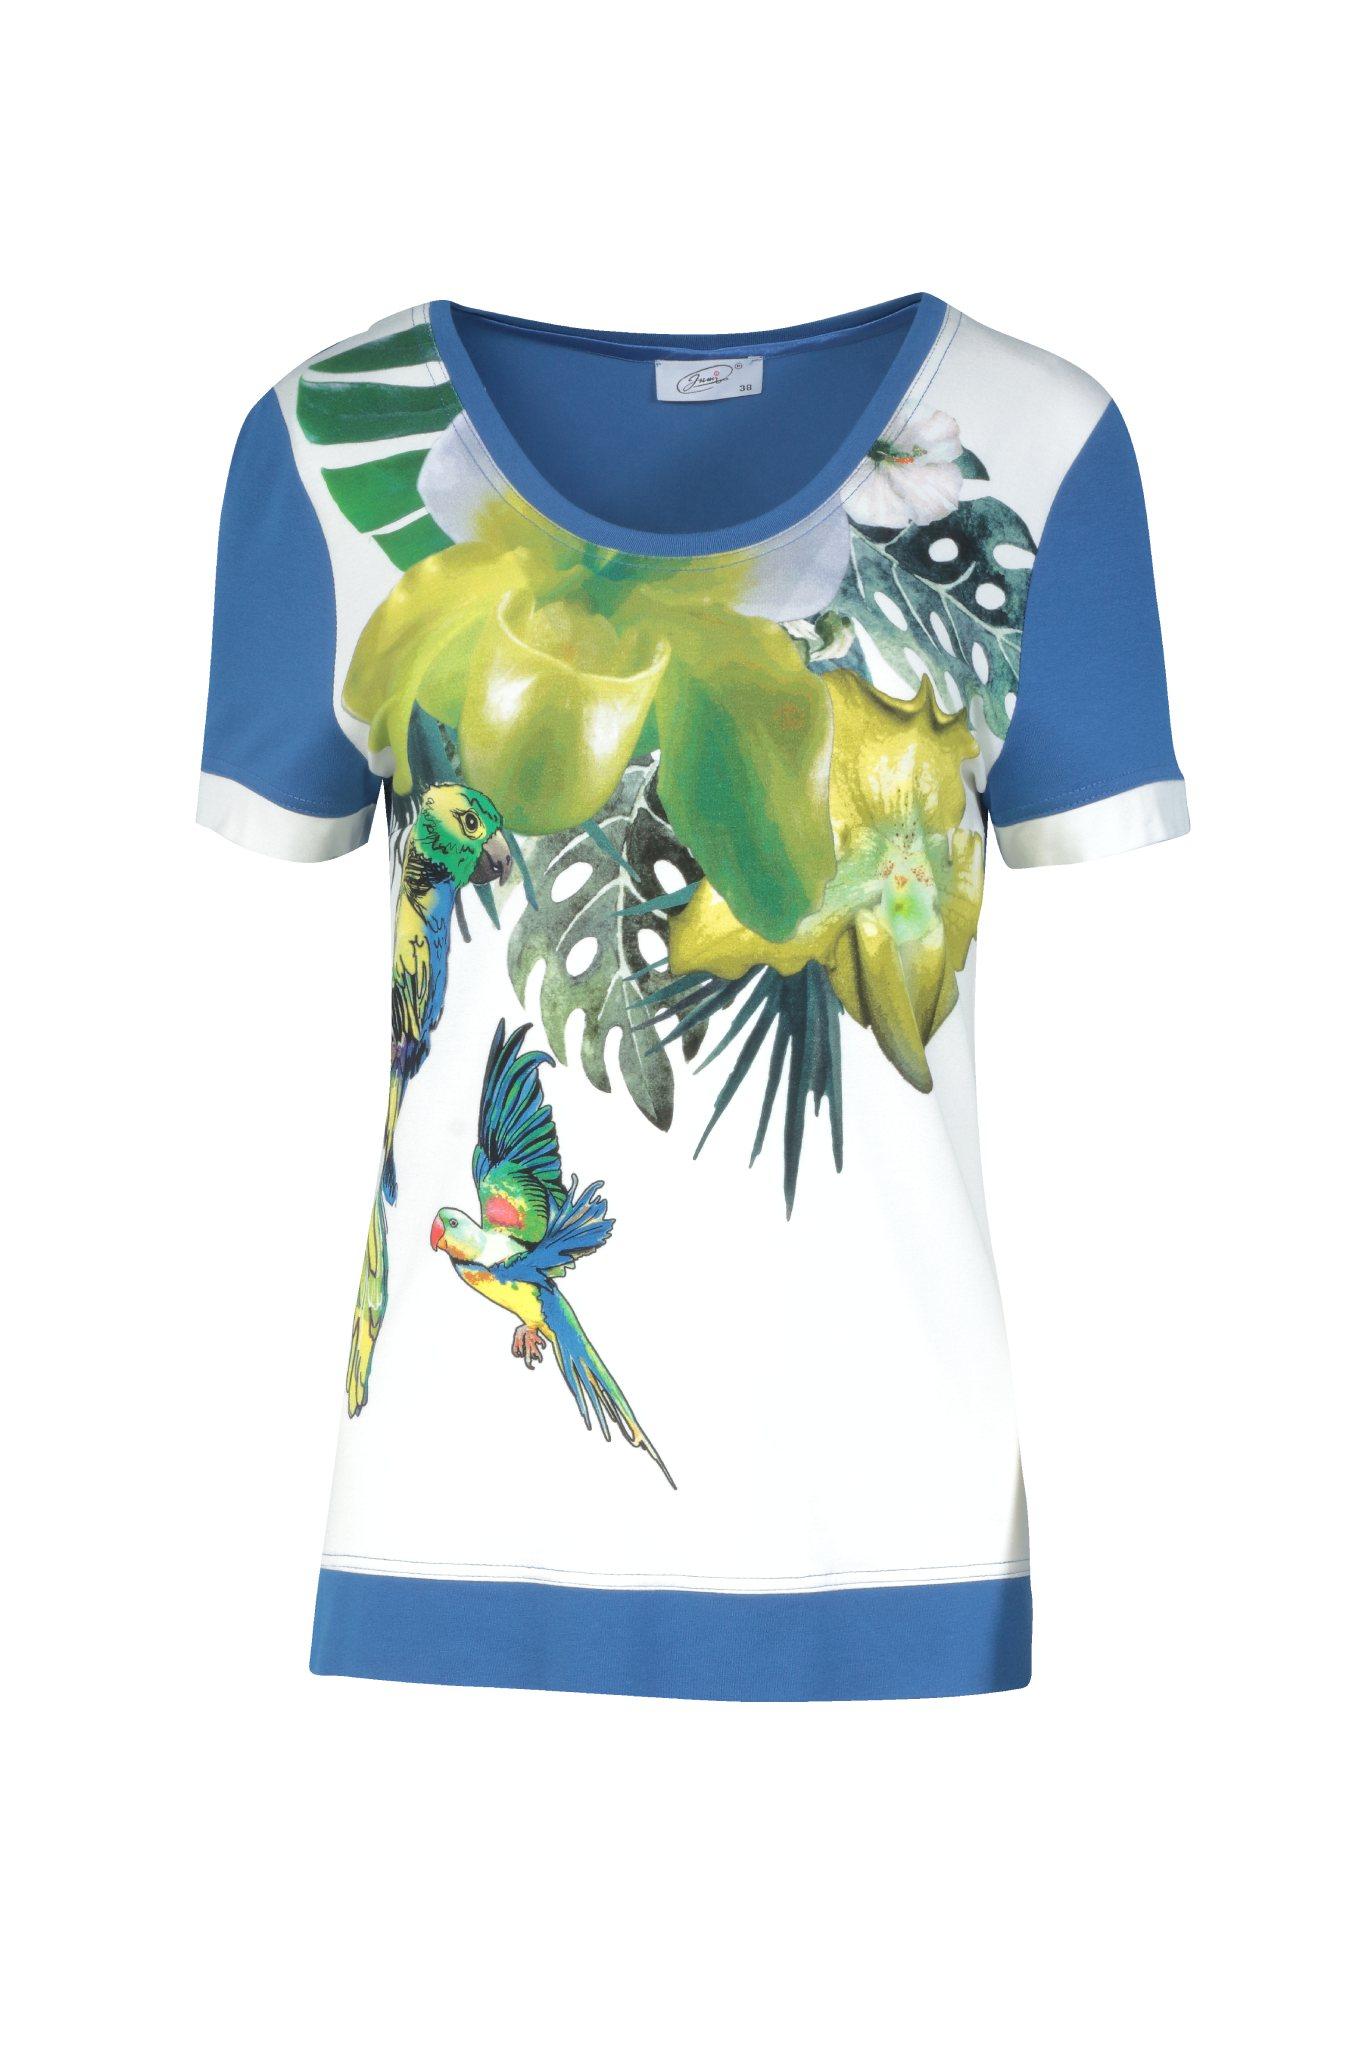 987 Jumitex bluzka z papugami